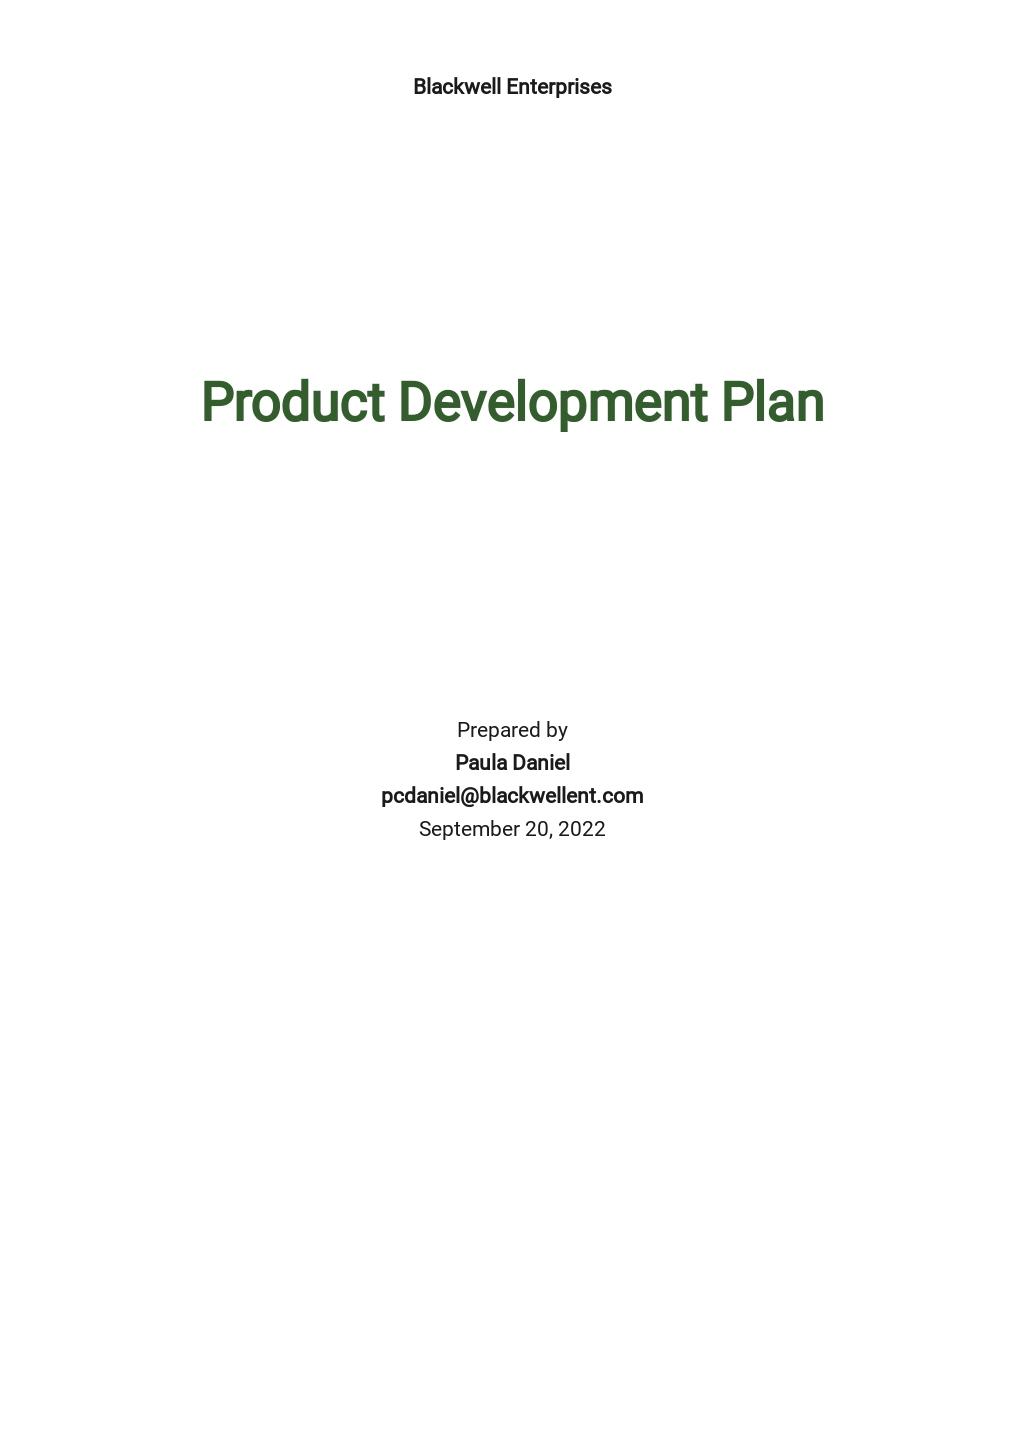 Product Development Plan Template